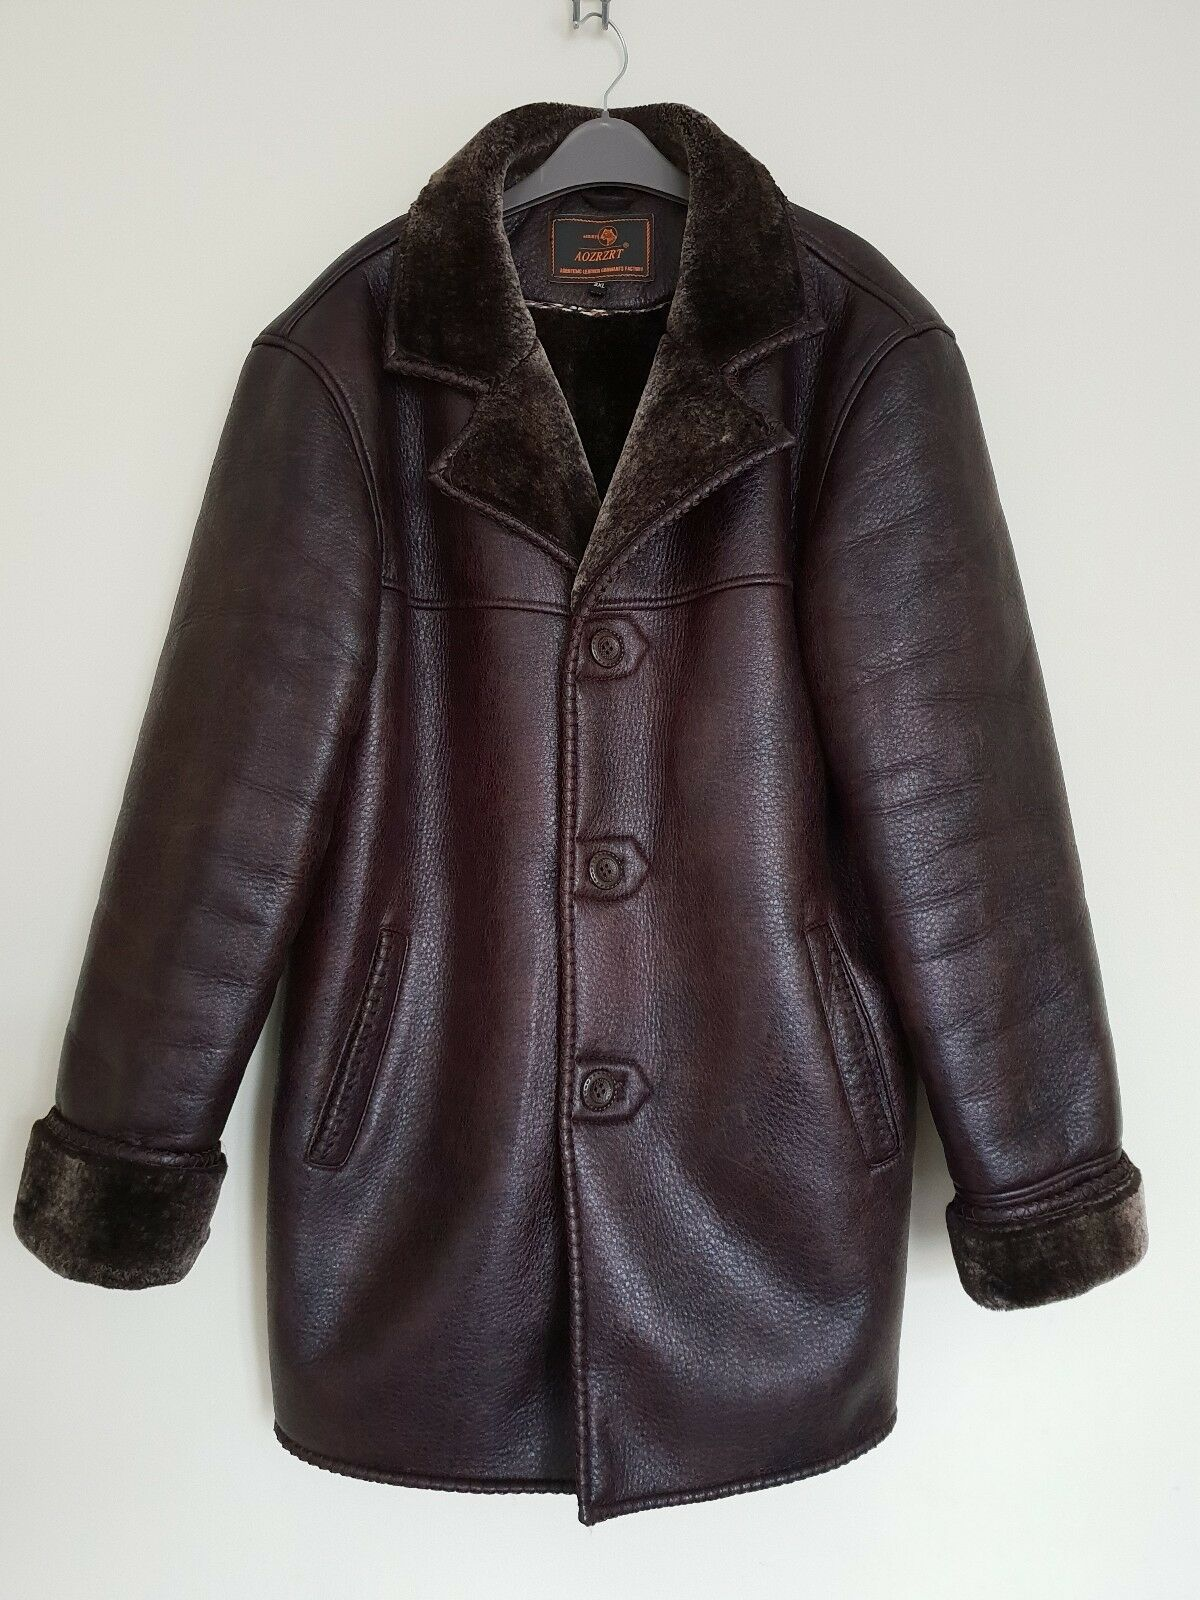 AOZRZRT Mens Dark braun Cosy Jacket Größe L   XL